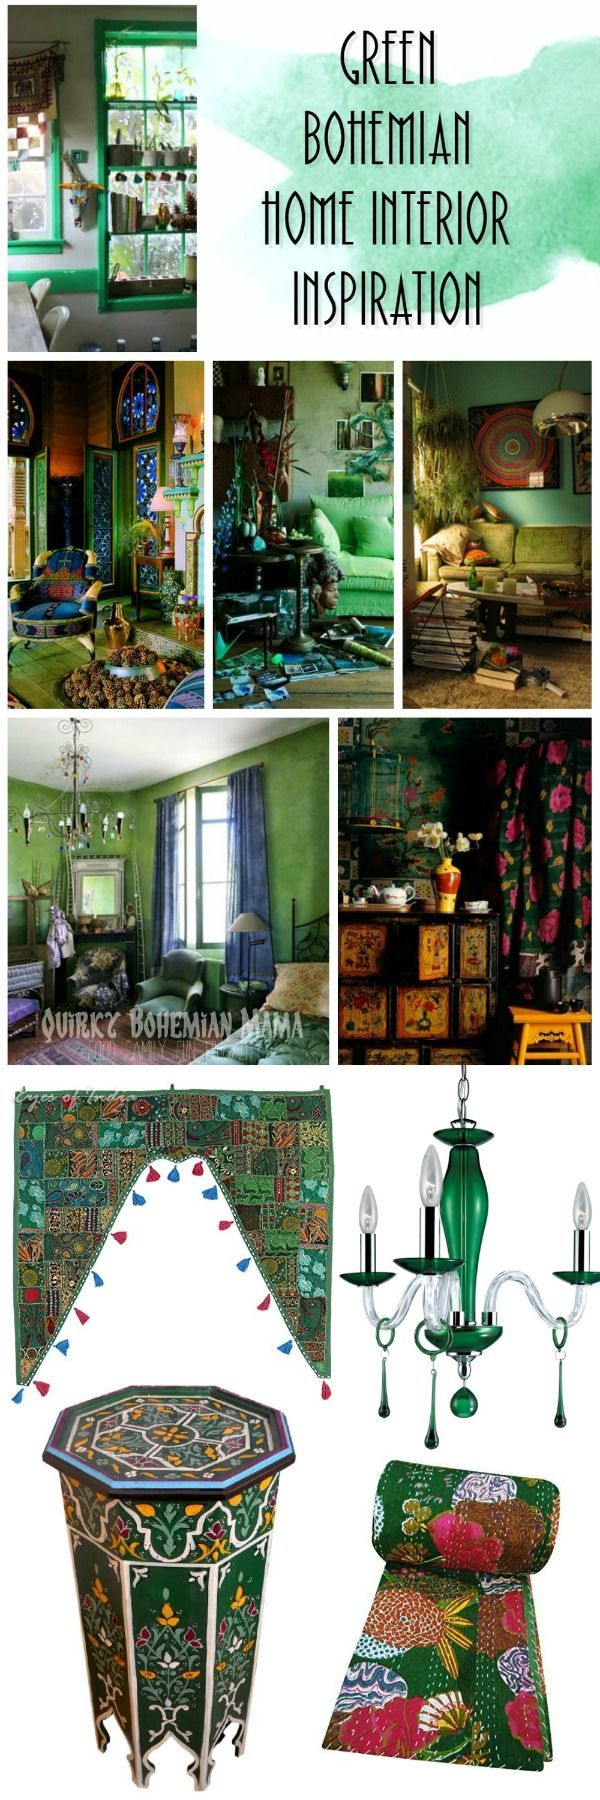 Green Bohemian Home Interior Inspiration {Bohemian/boho St Patrick's Day}